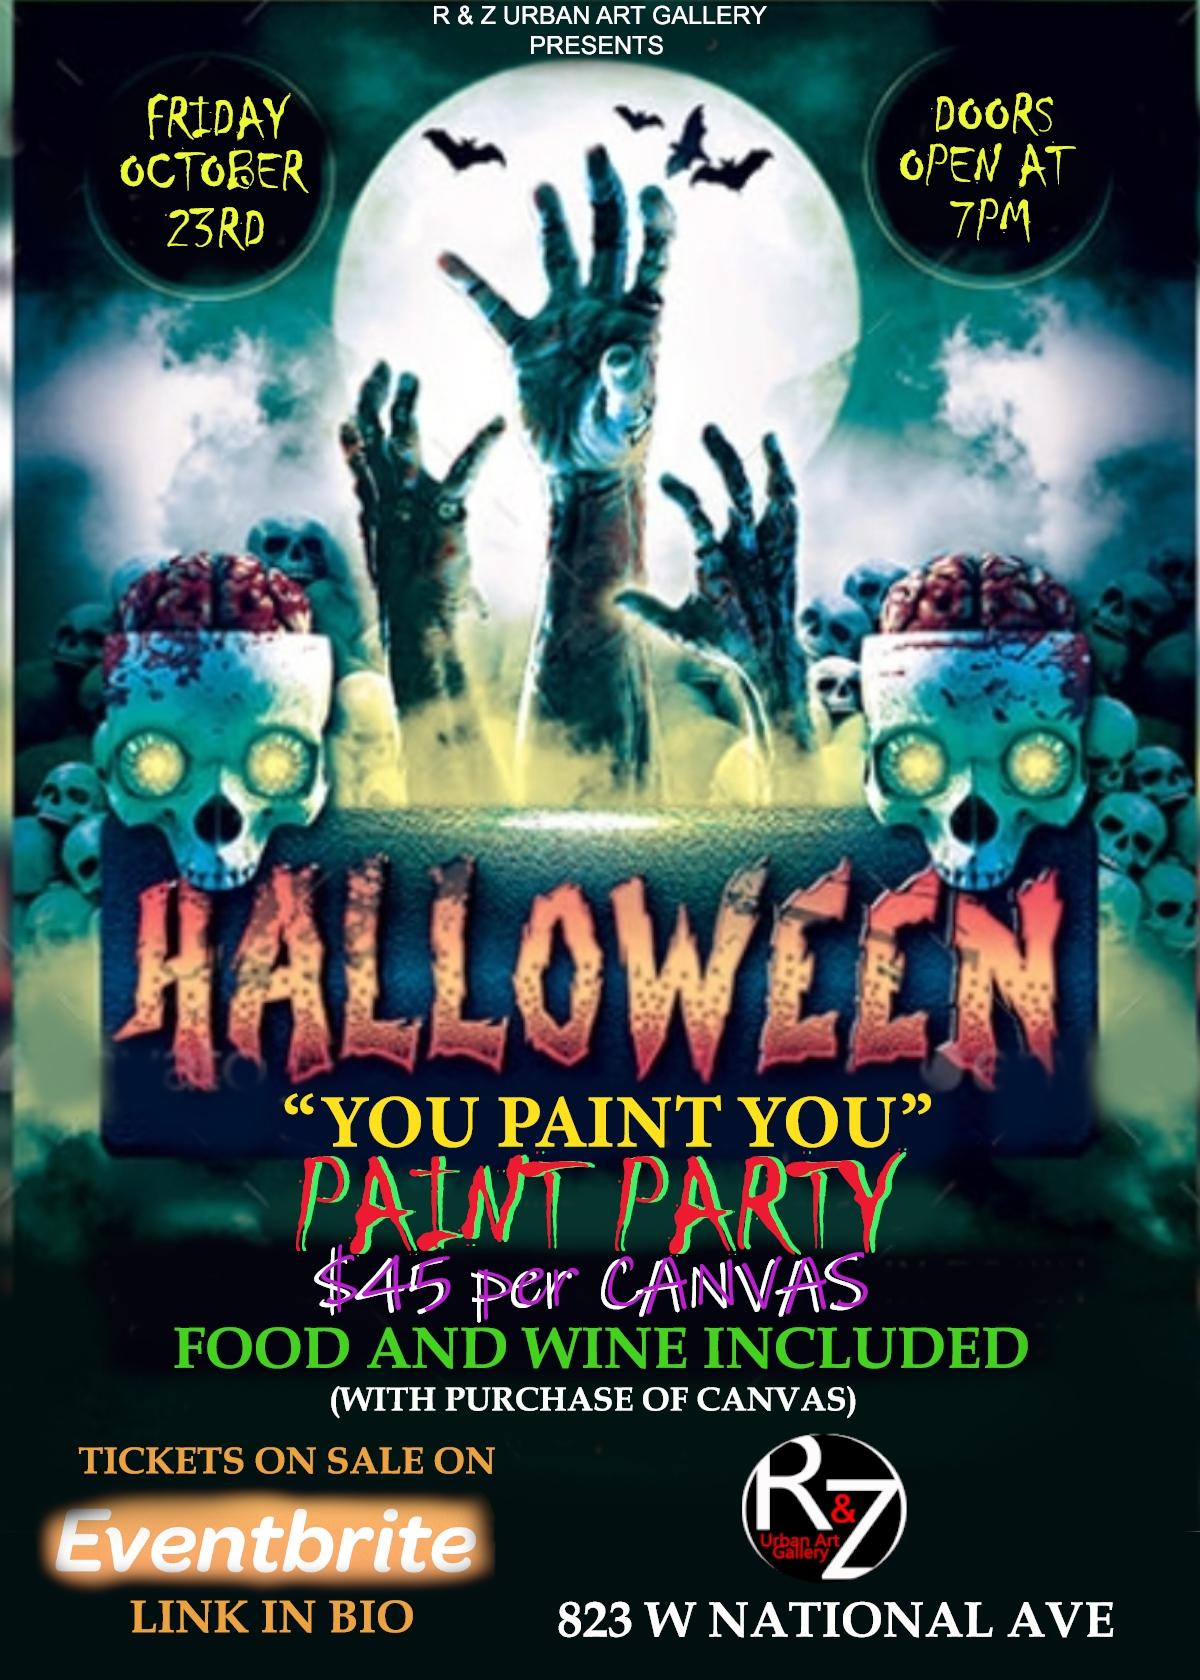 October Halloween 2020 Parties Milwaukee HALLOWEEN YOU PAINT YOU Party   23 OCT 2020